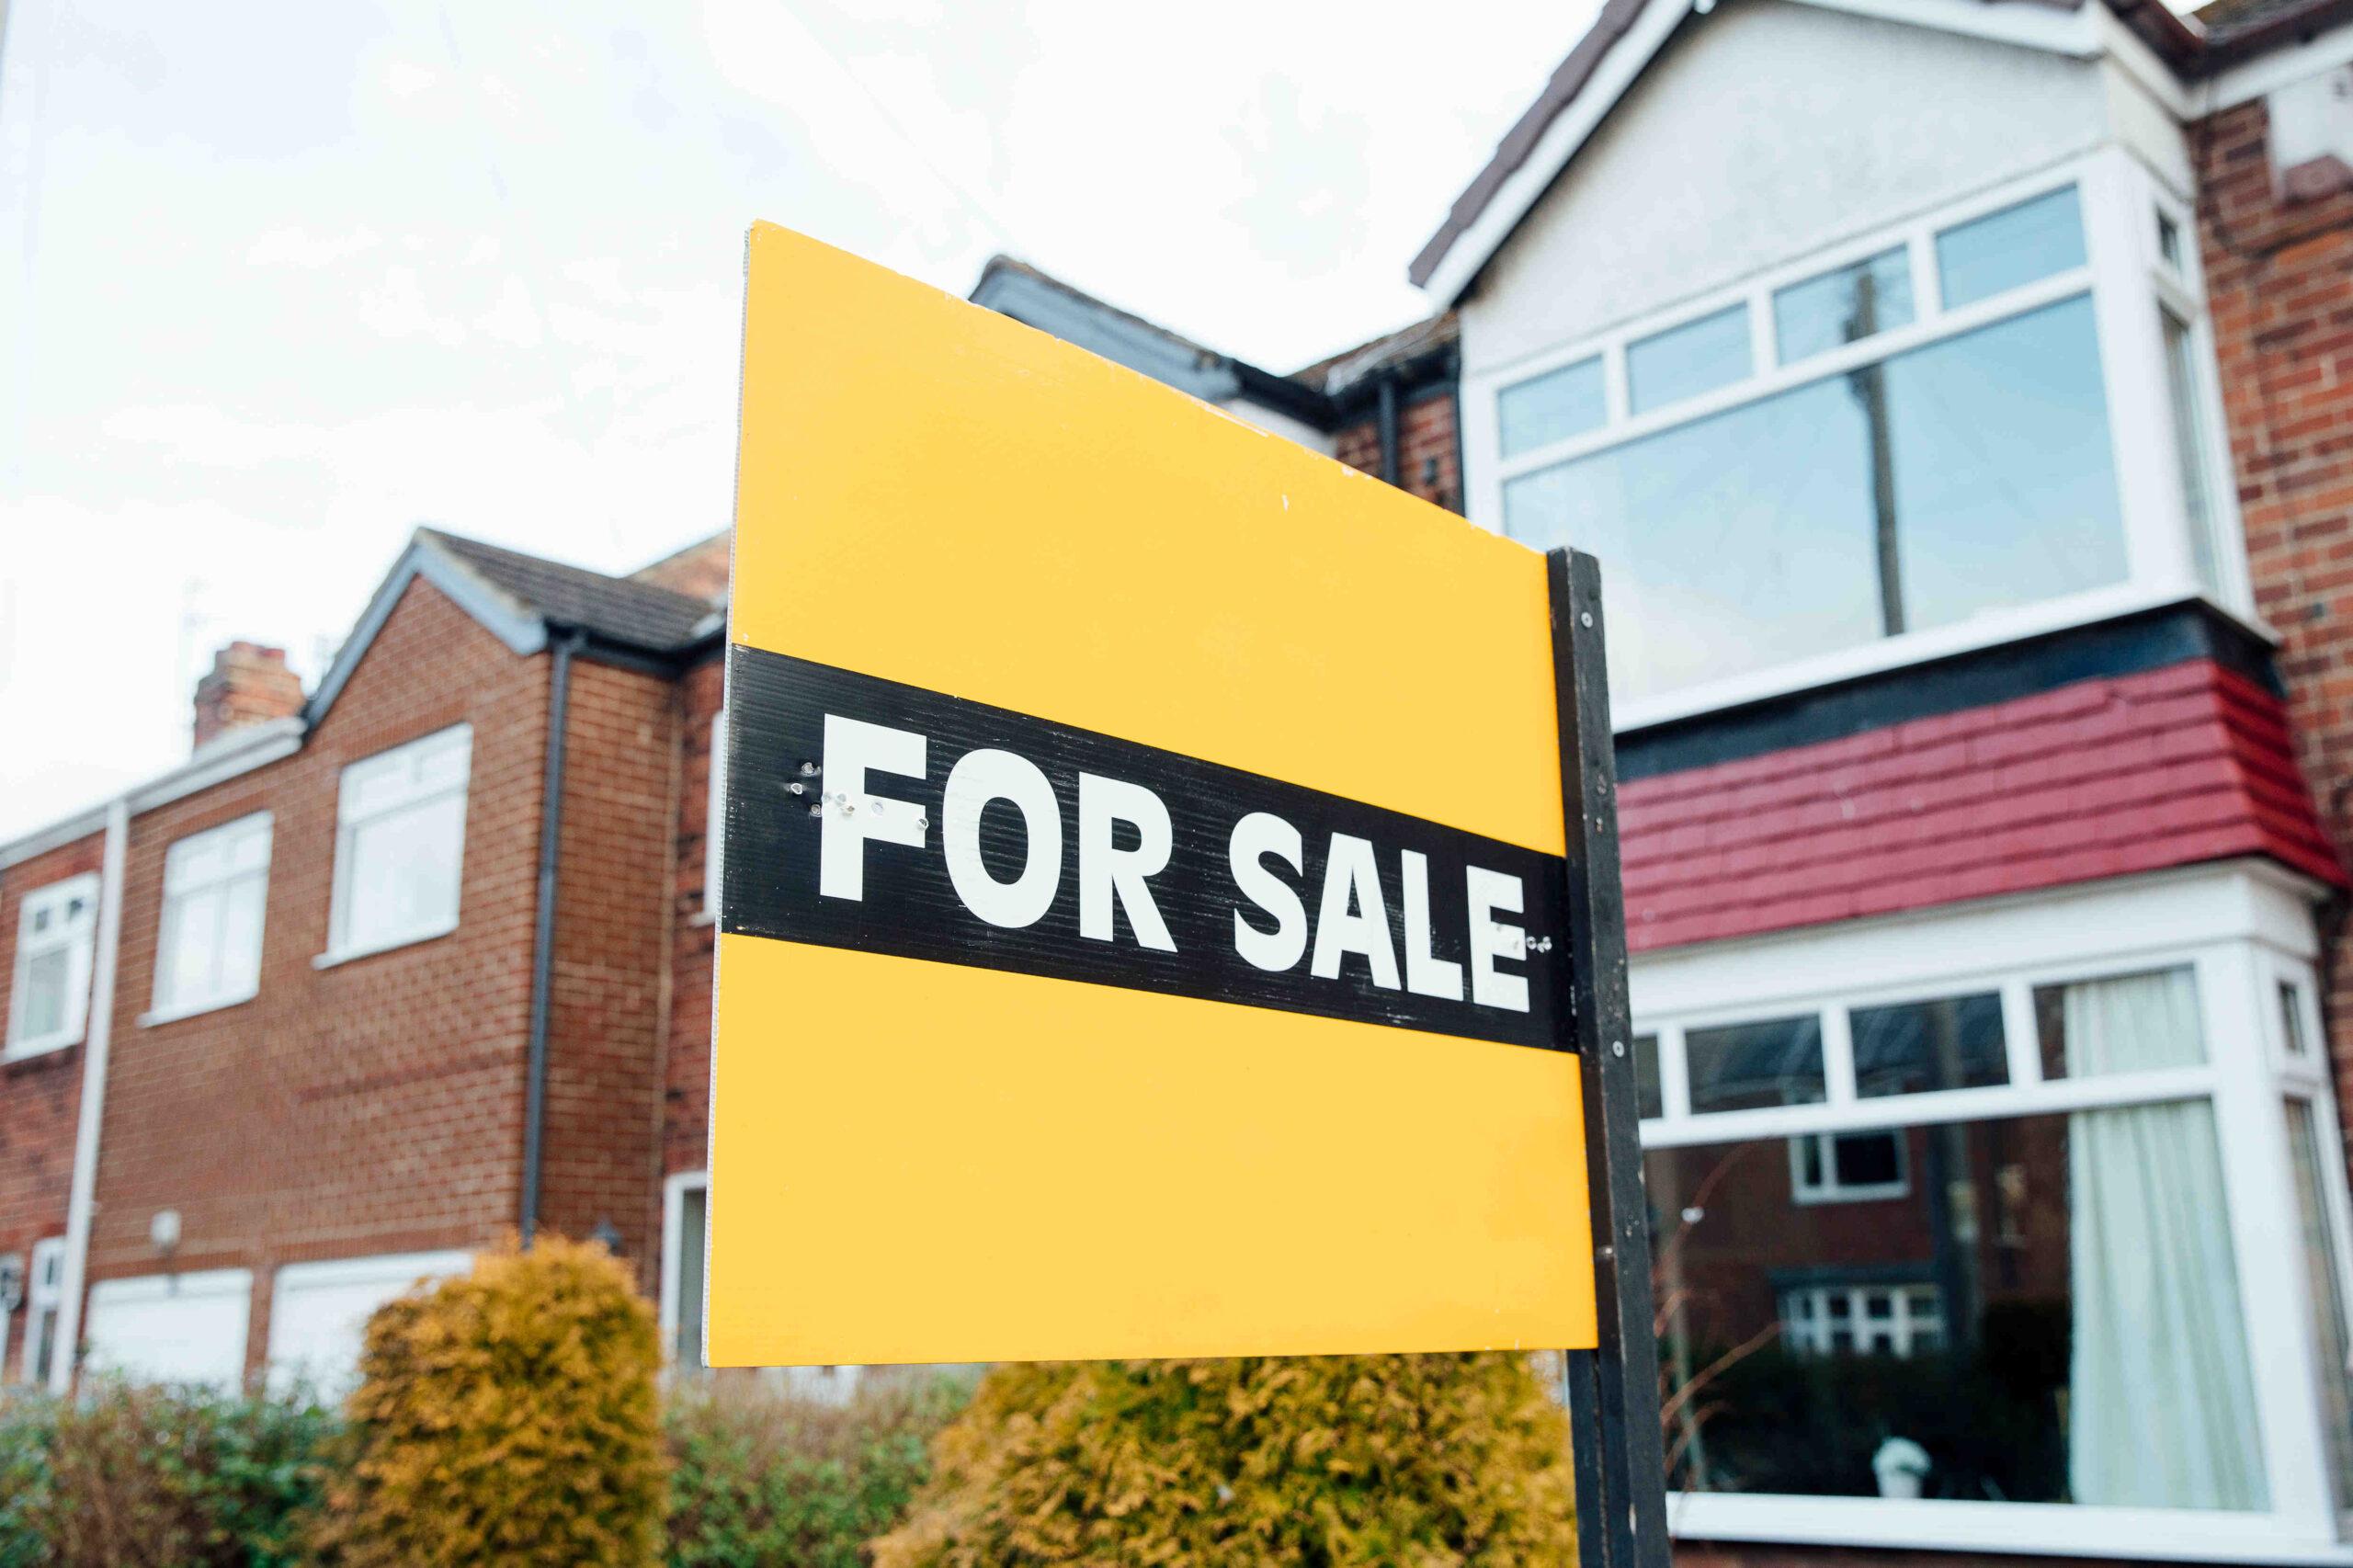 €1.7m in sales as 10 properties sold in Killarney last month